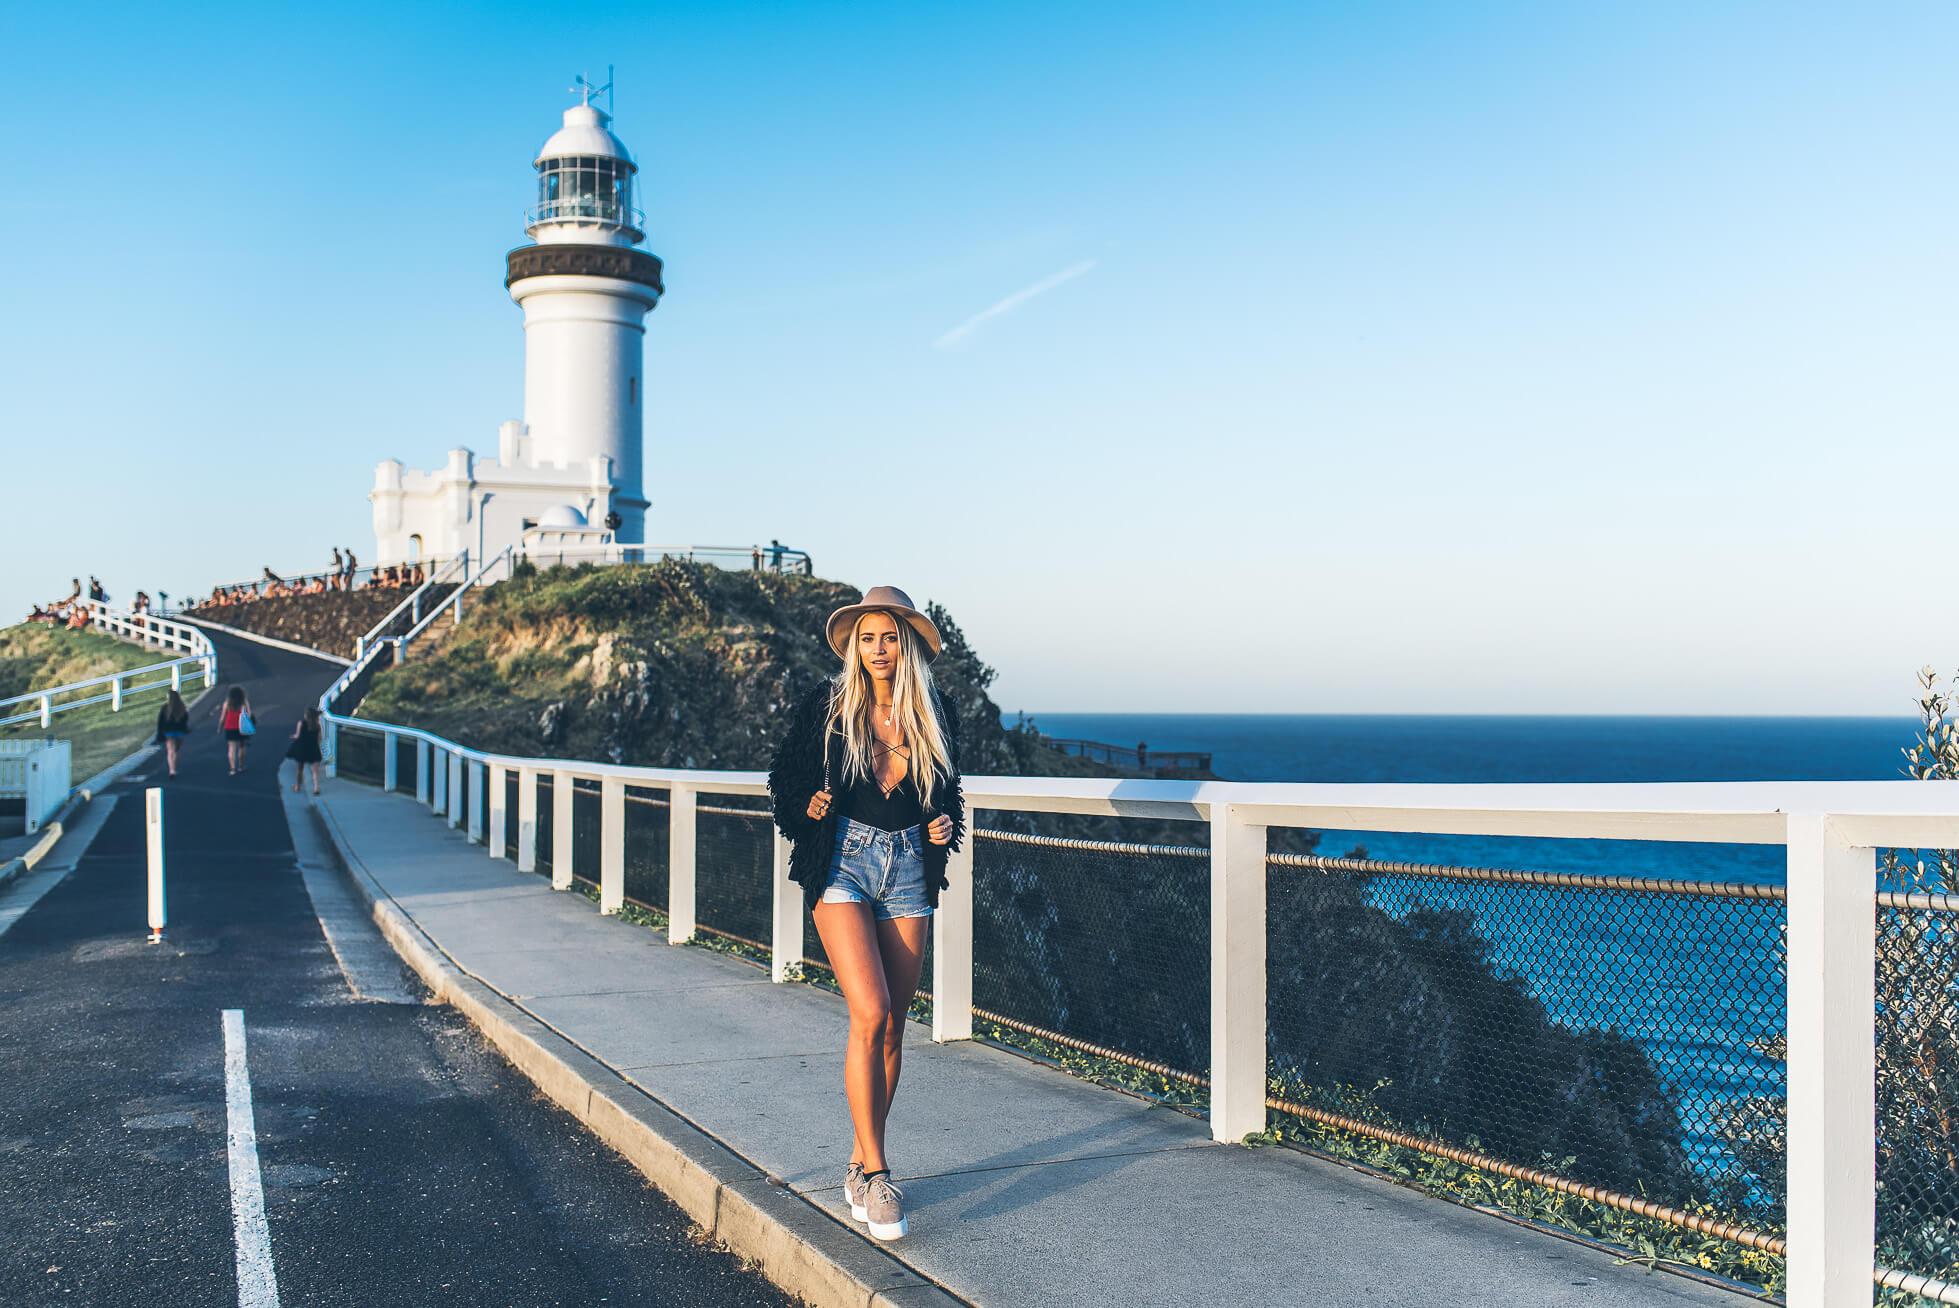 janni-deler-the-lighthouse-byronbayDSC_3902